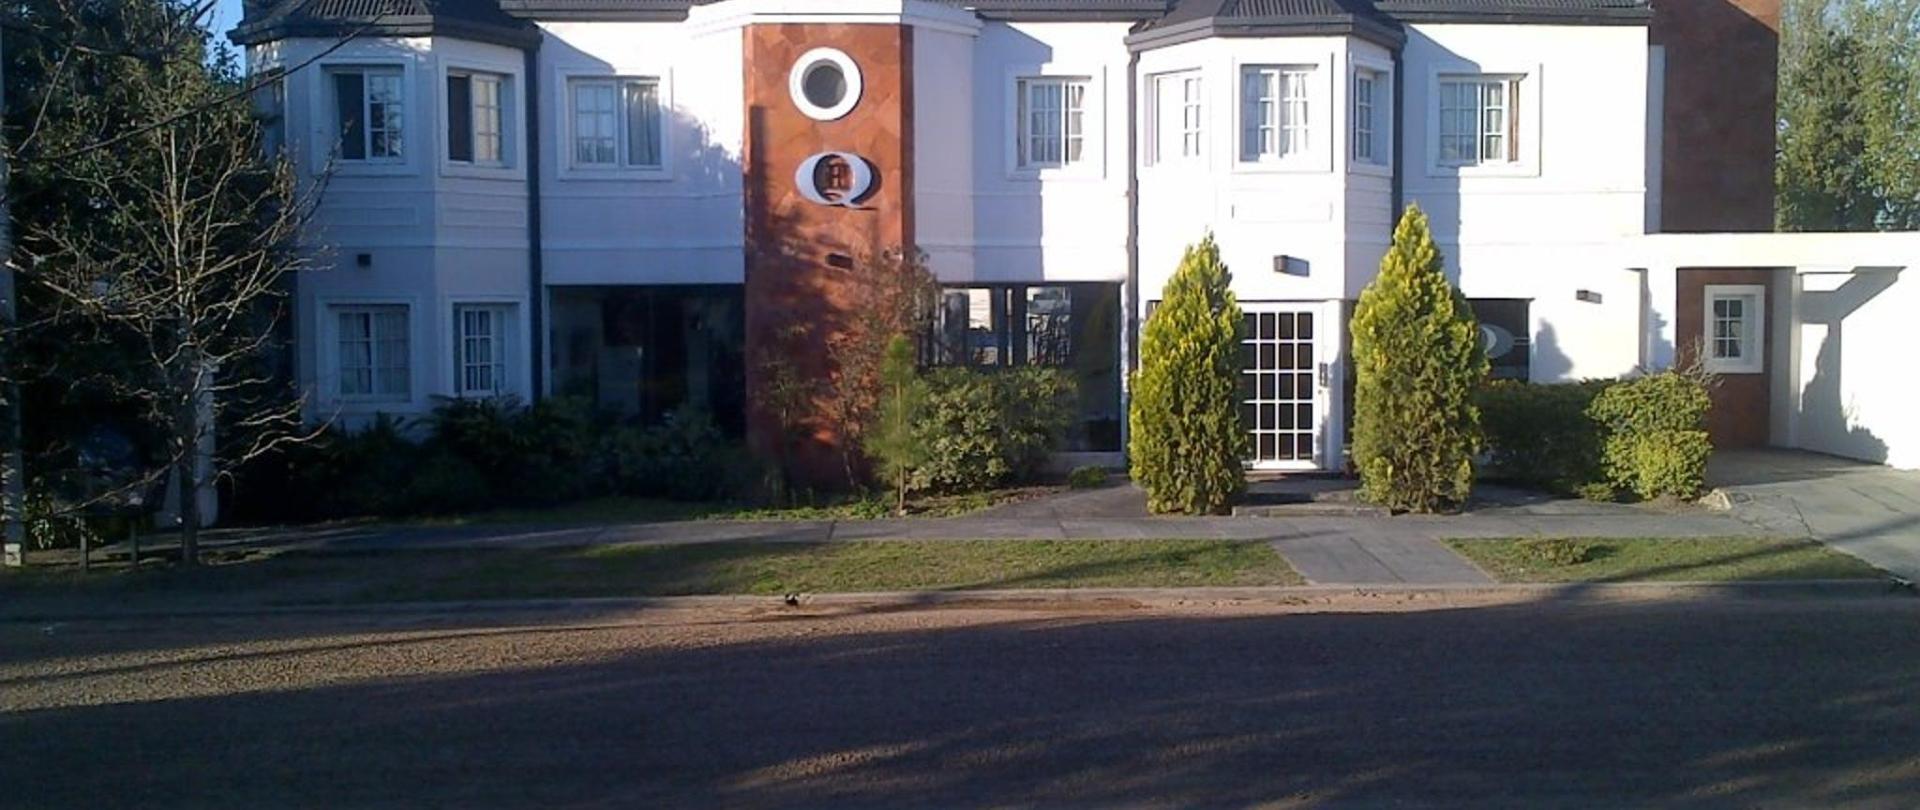 Frente Hotel Queguay1.JPG